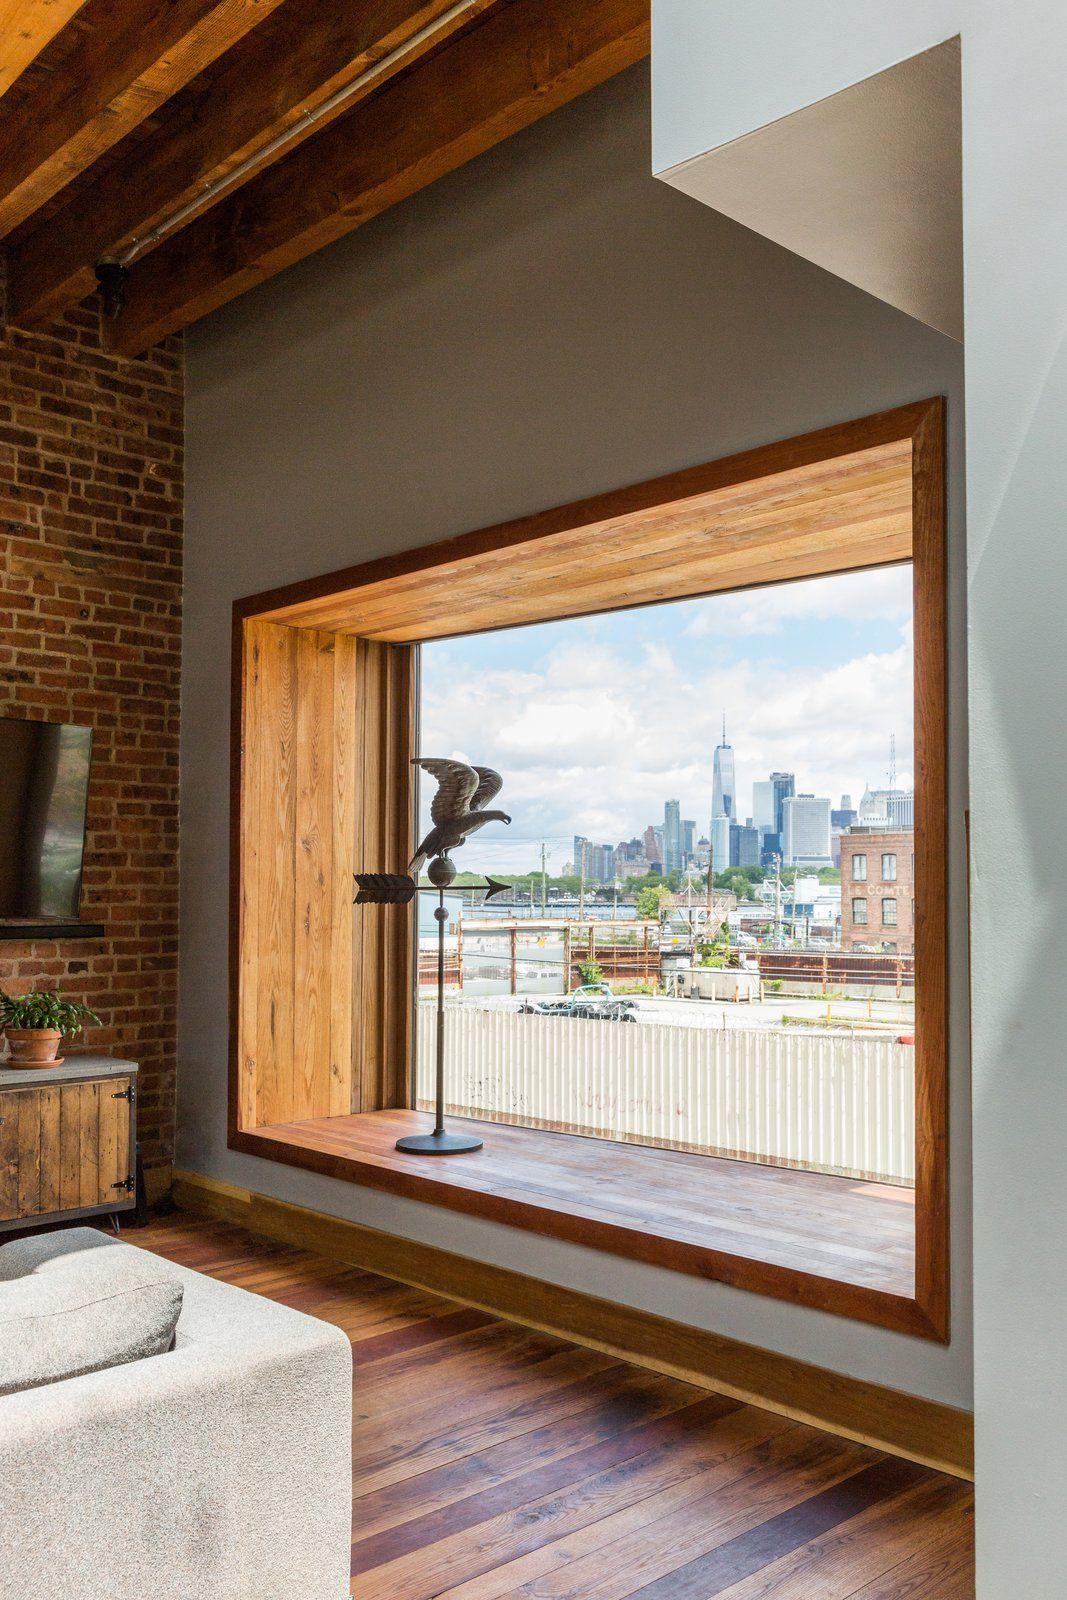 Modern Home With Windows Picture Window Type And Wood Bay Window Is Angled To Capture Manhattan Skyline Views P Bow Window Window Seat Design Modern Windows